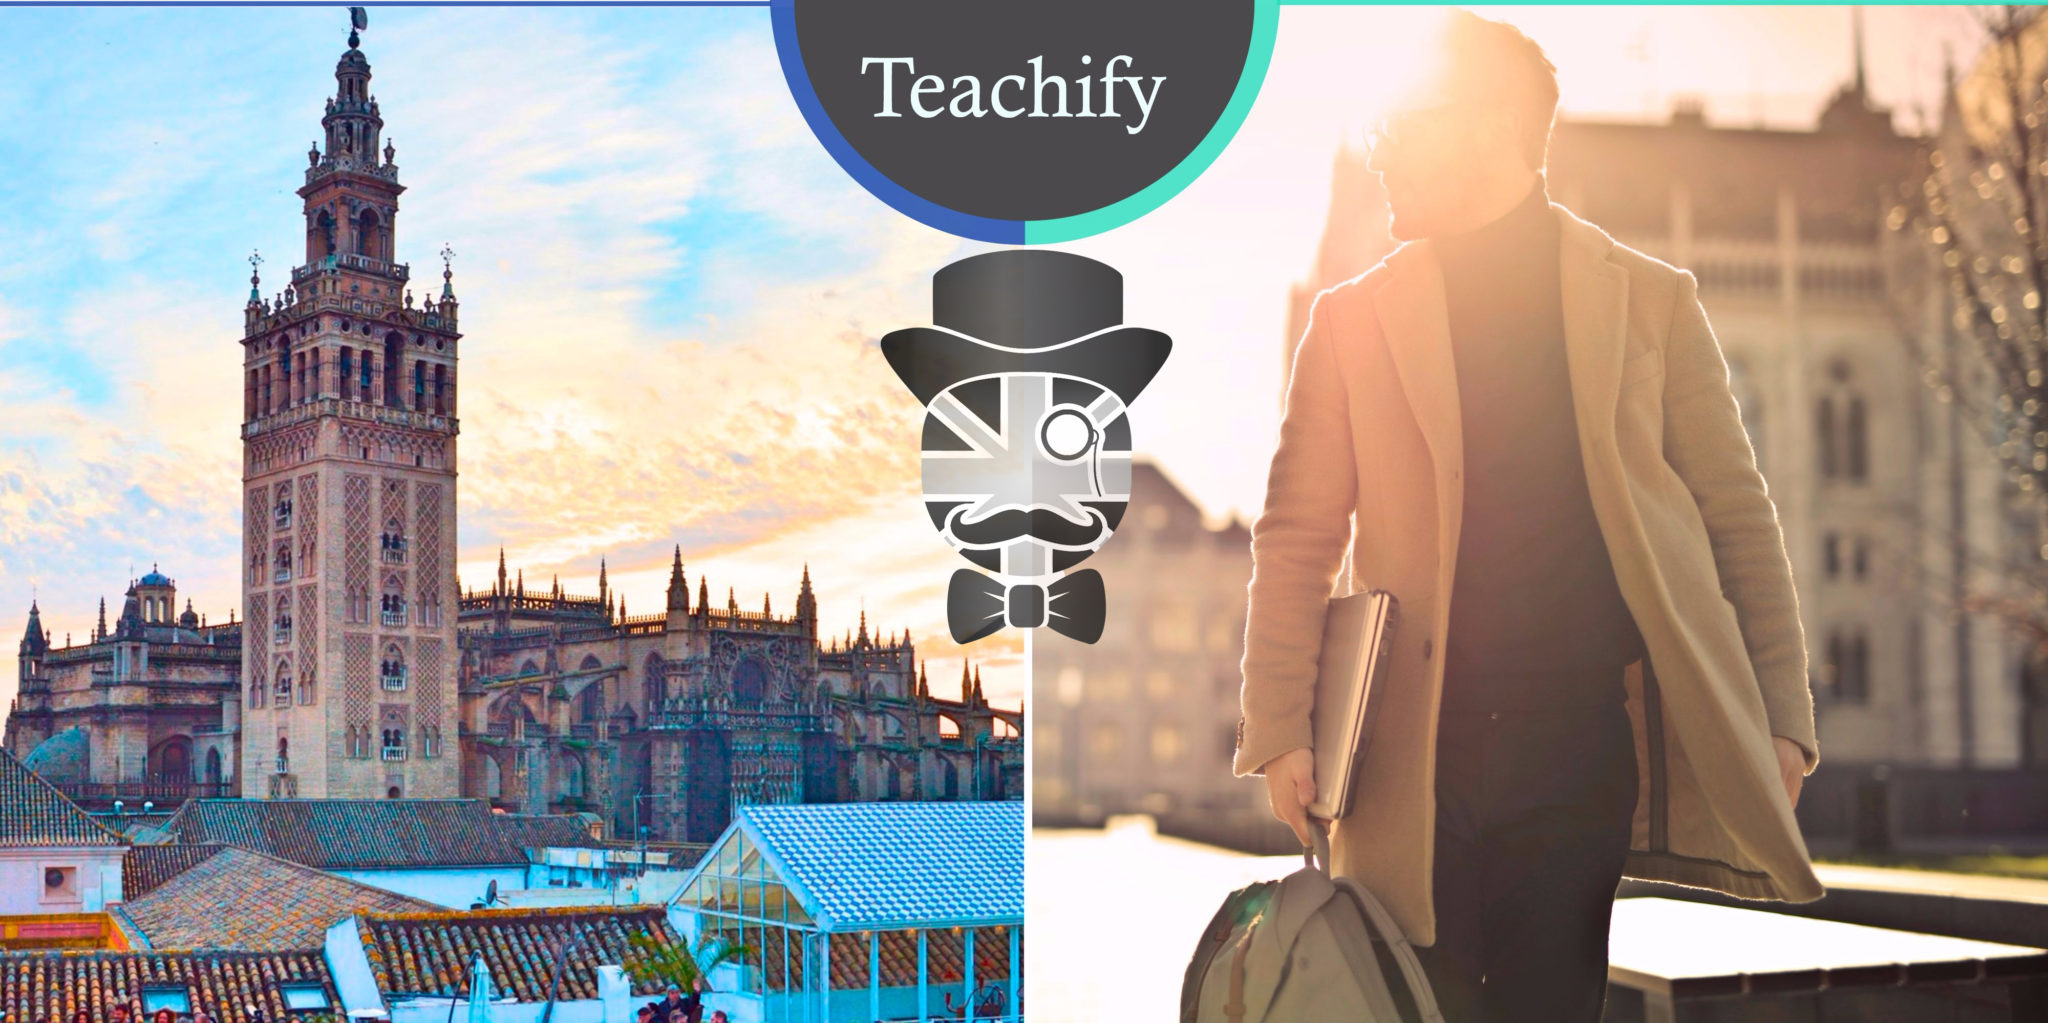 Teachify